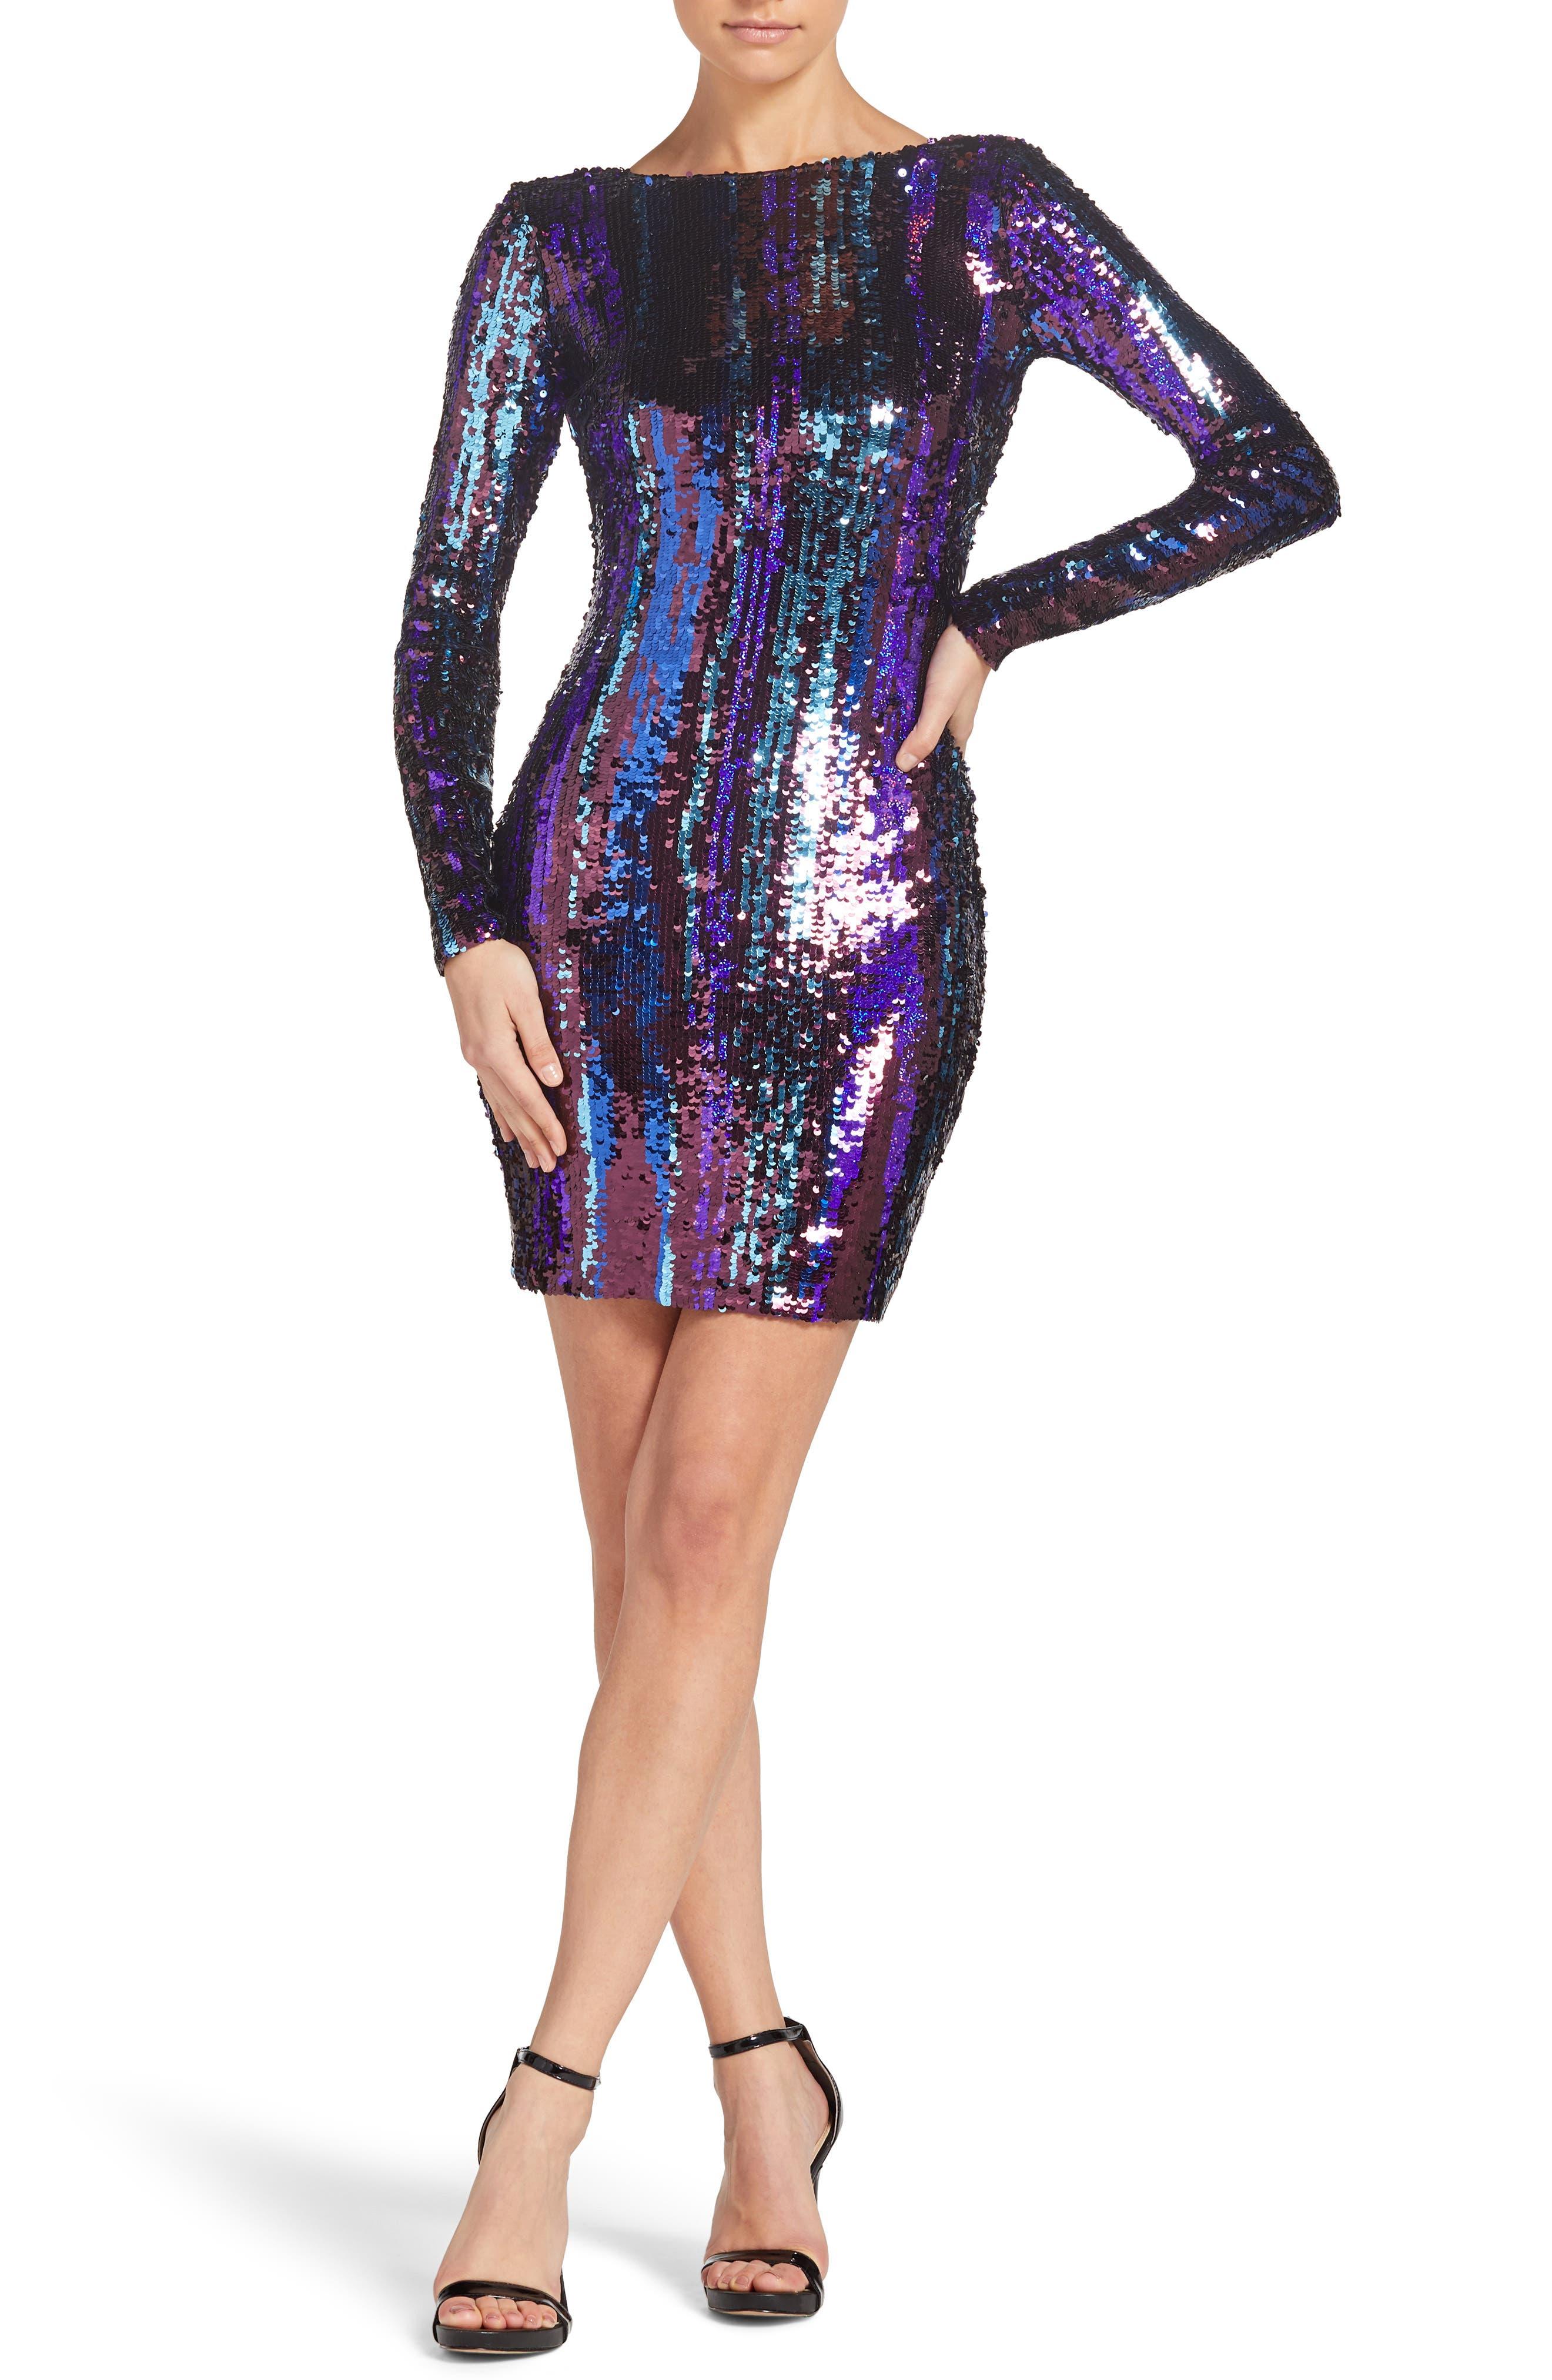 DRESS THE POPULATION Lola Sequin Body-Con Dress in Merlot Multi